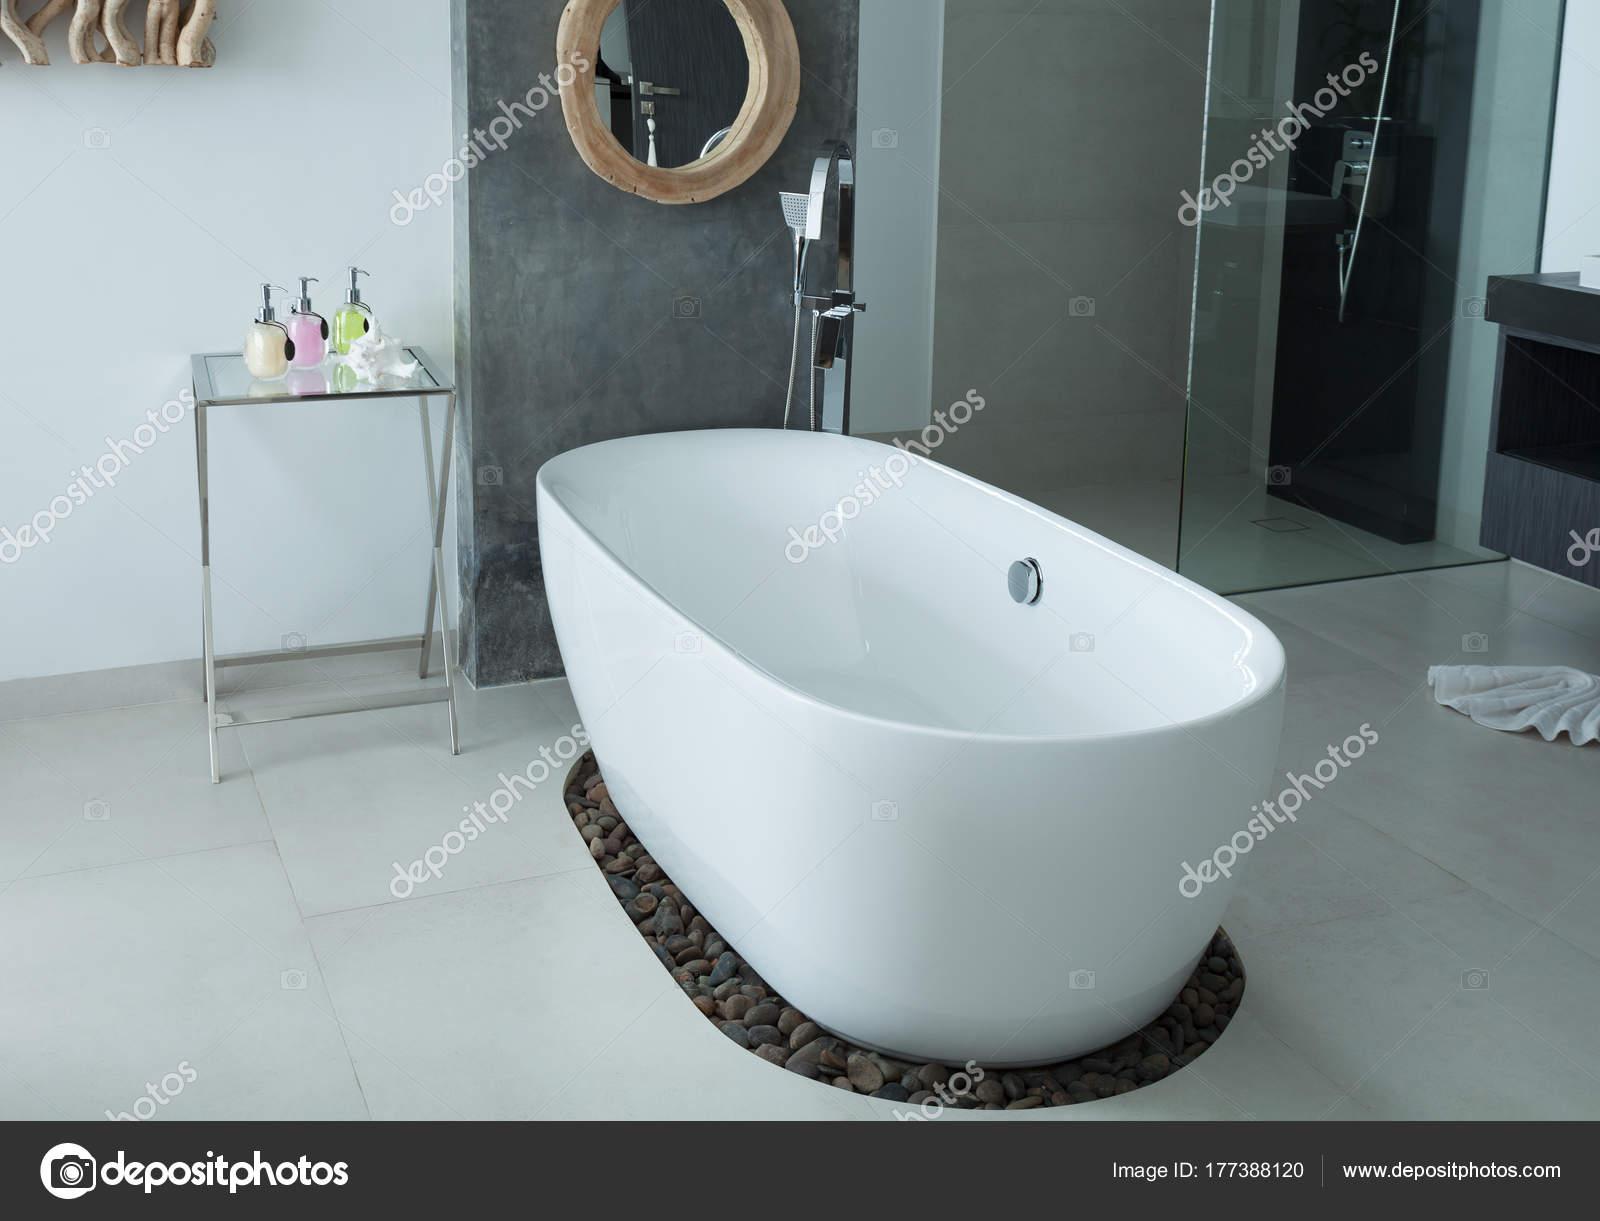 Vasca Da Bagno Design Moderno : Moderno bagno interno vasca da bagno u foto stock panya